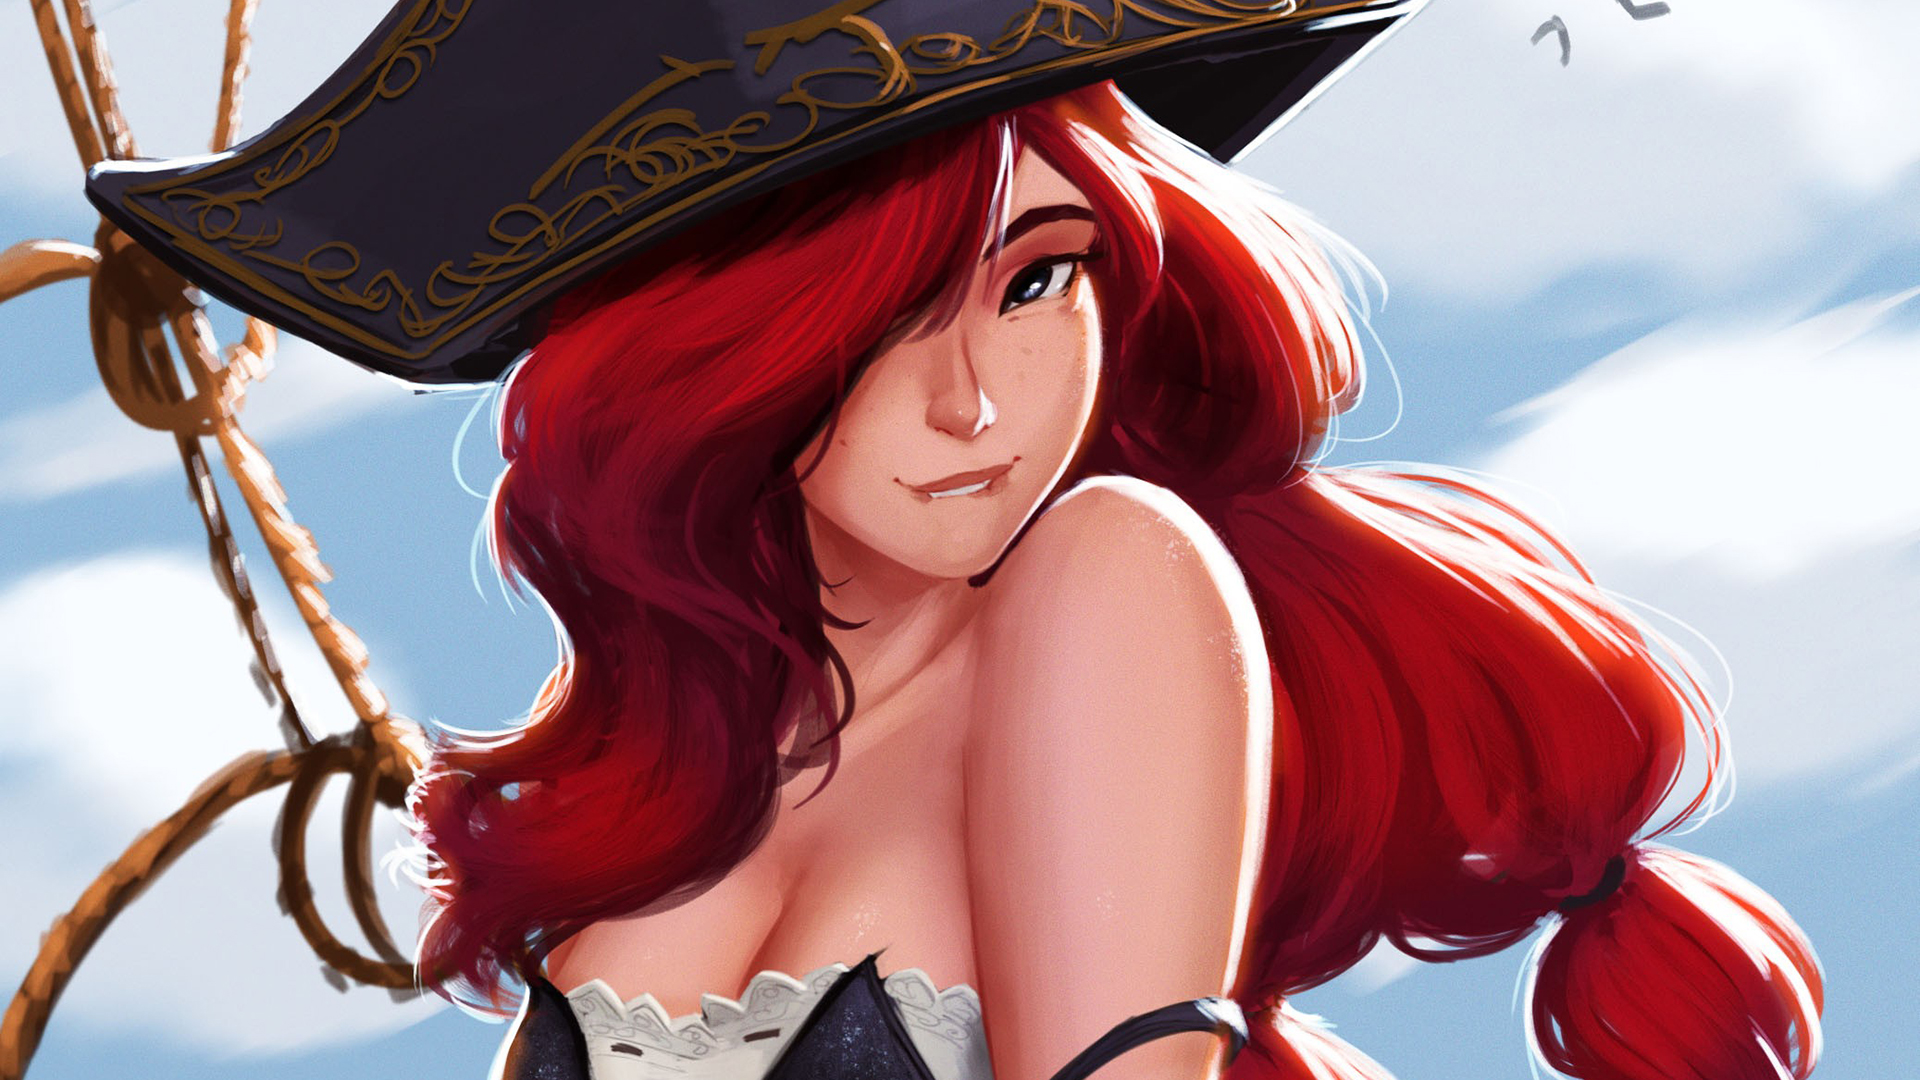 General 1920x1080 video games women cleavage big boobs redhead digital art artwork League of Legends Miss Fortune pirates sensual gaze biting lip